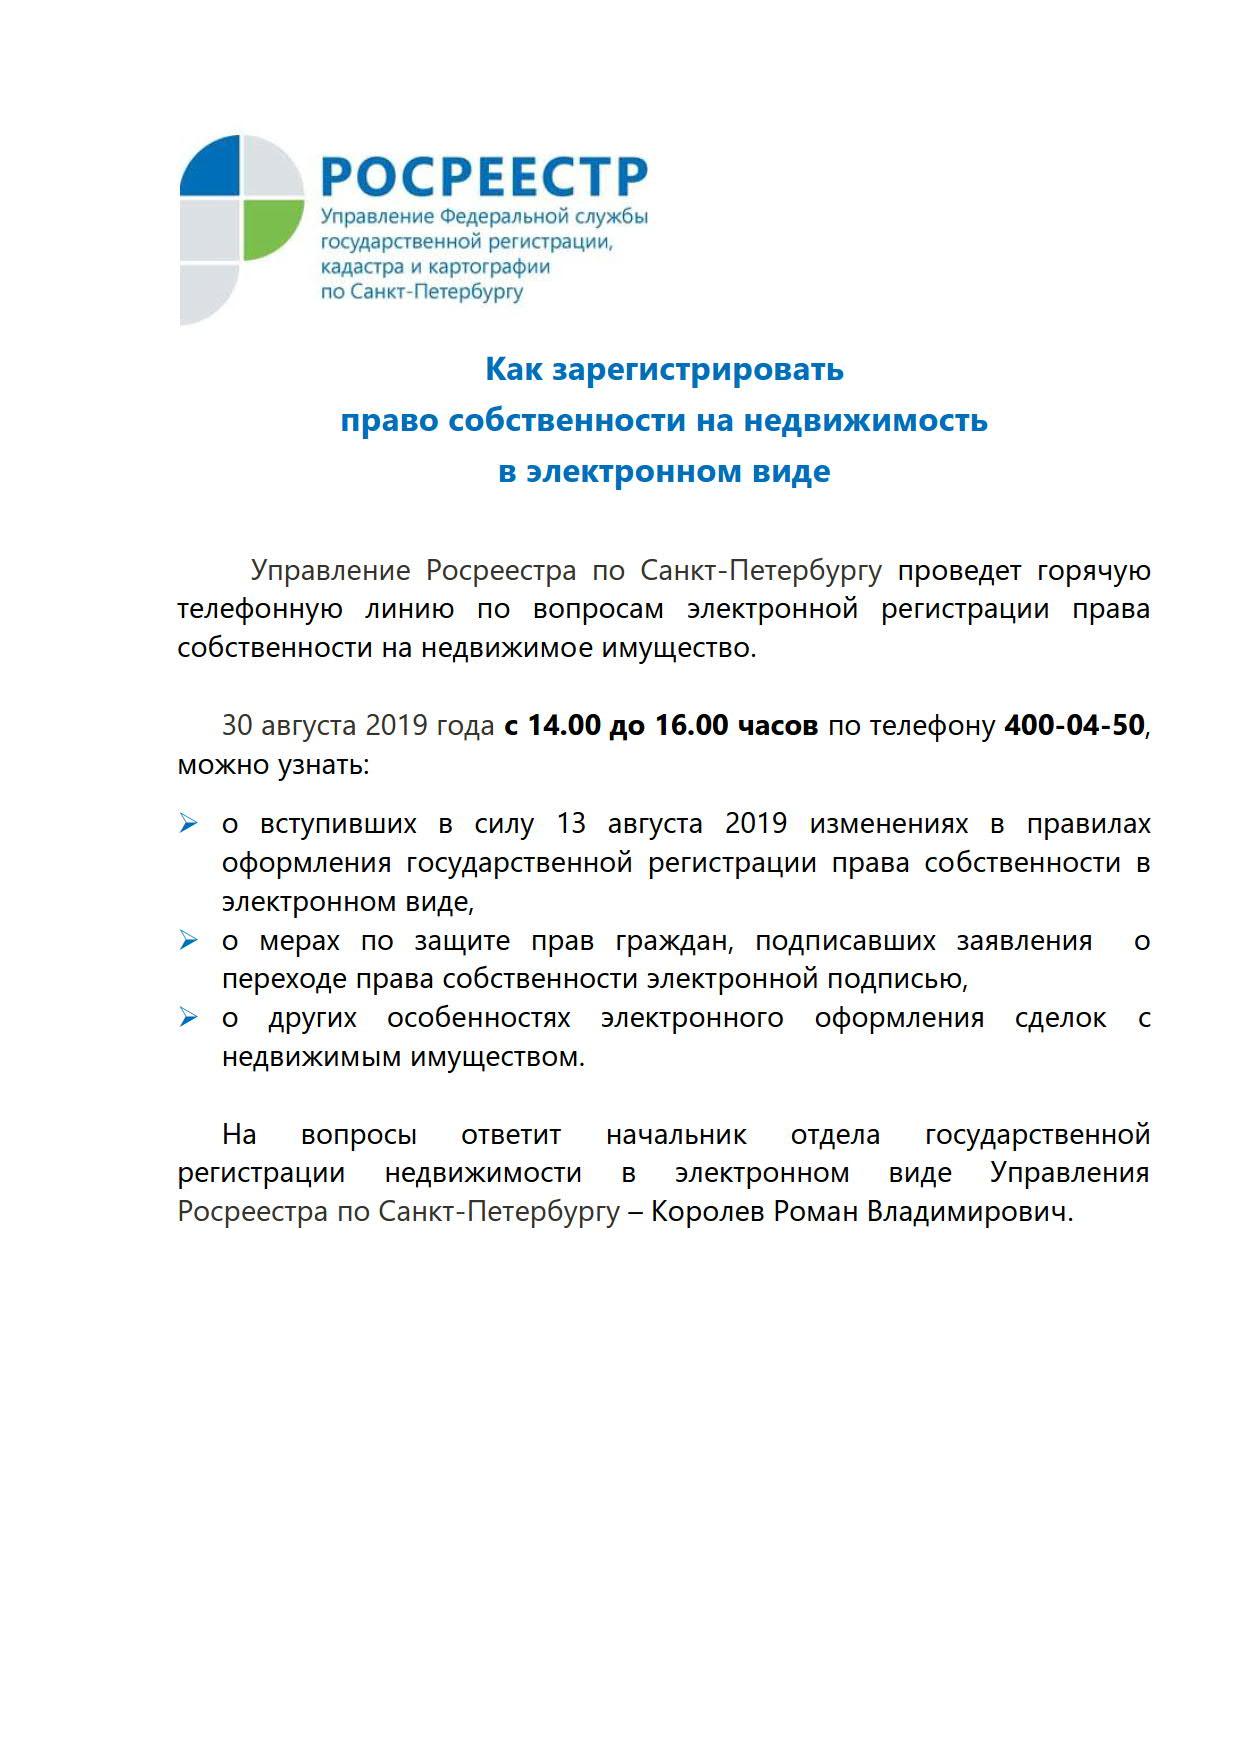 анонс 30.08.2019_рег прав в электронном виде_1